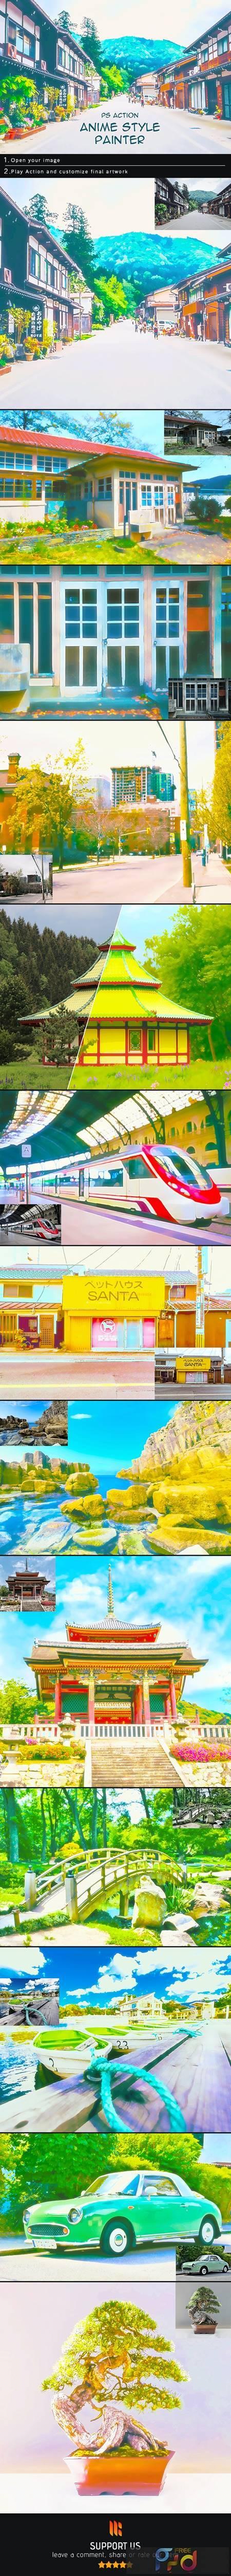 Anime Style Painter Photoshop Action 28231990 1